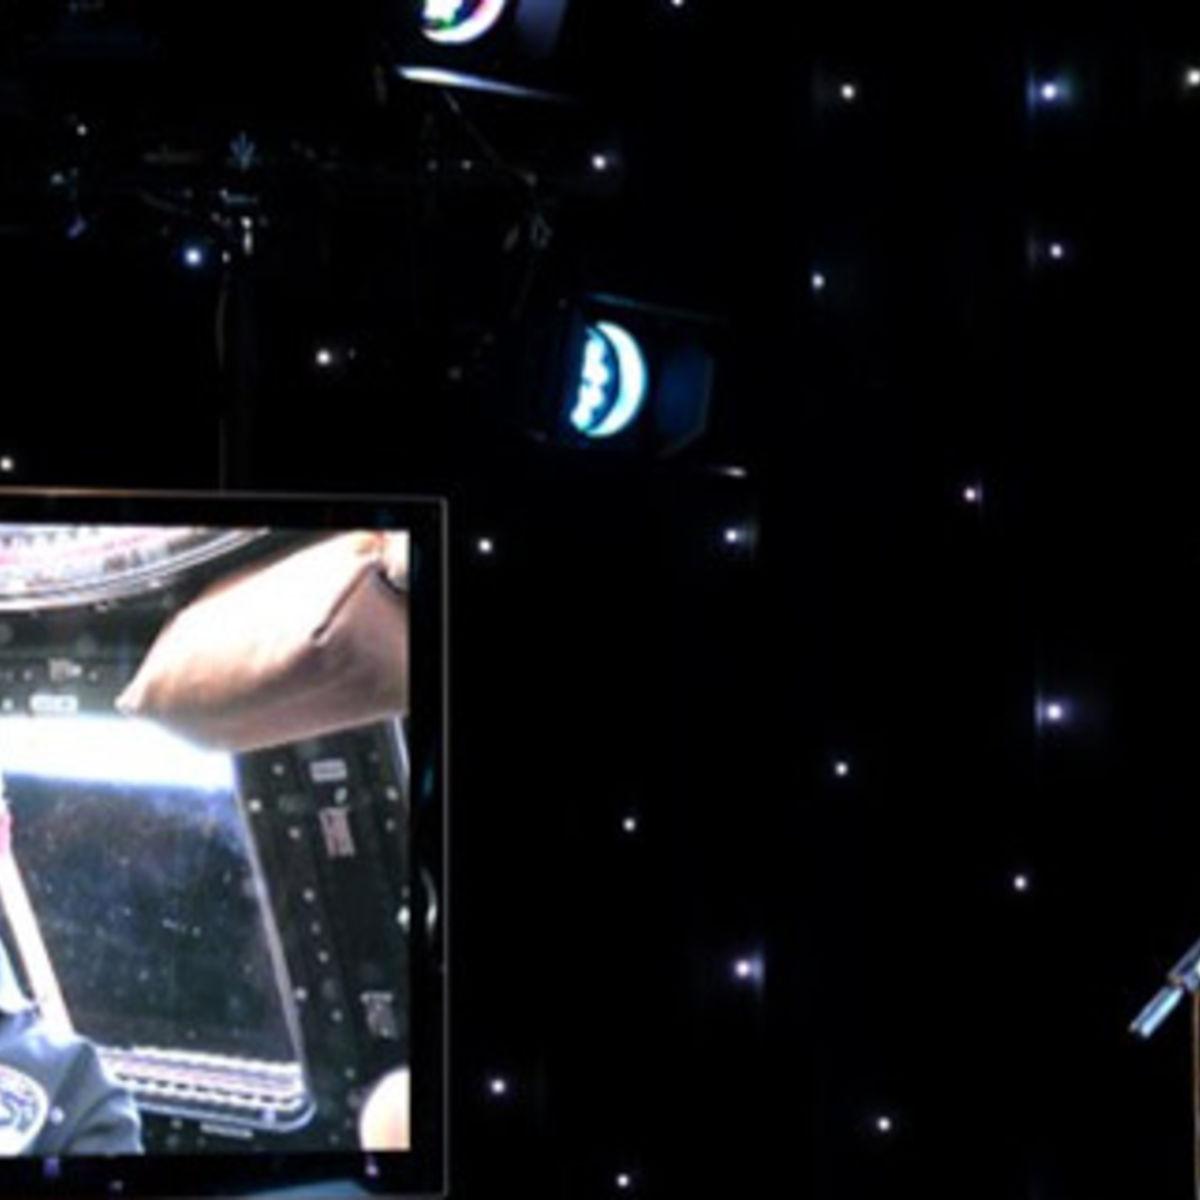 ISS_hadfield_robertson422556733.jpg